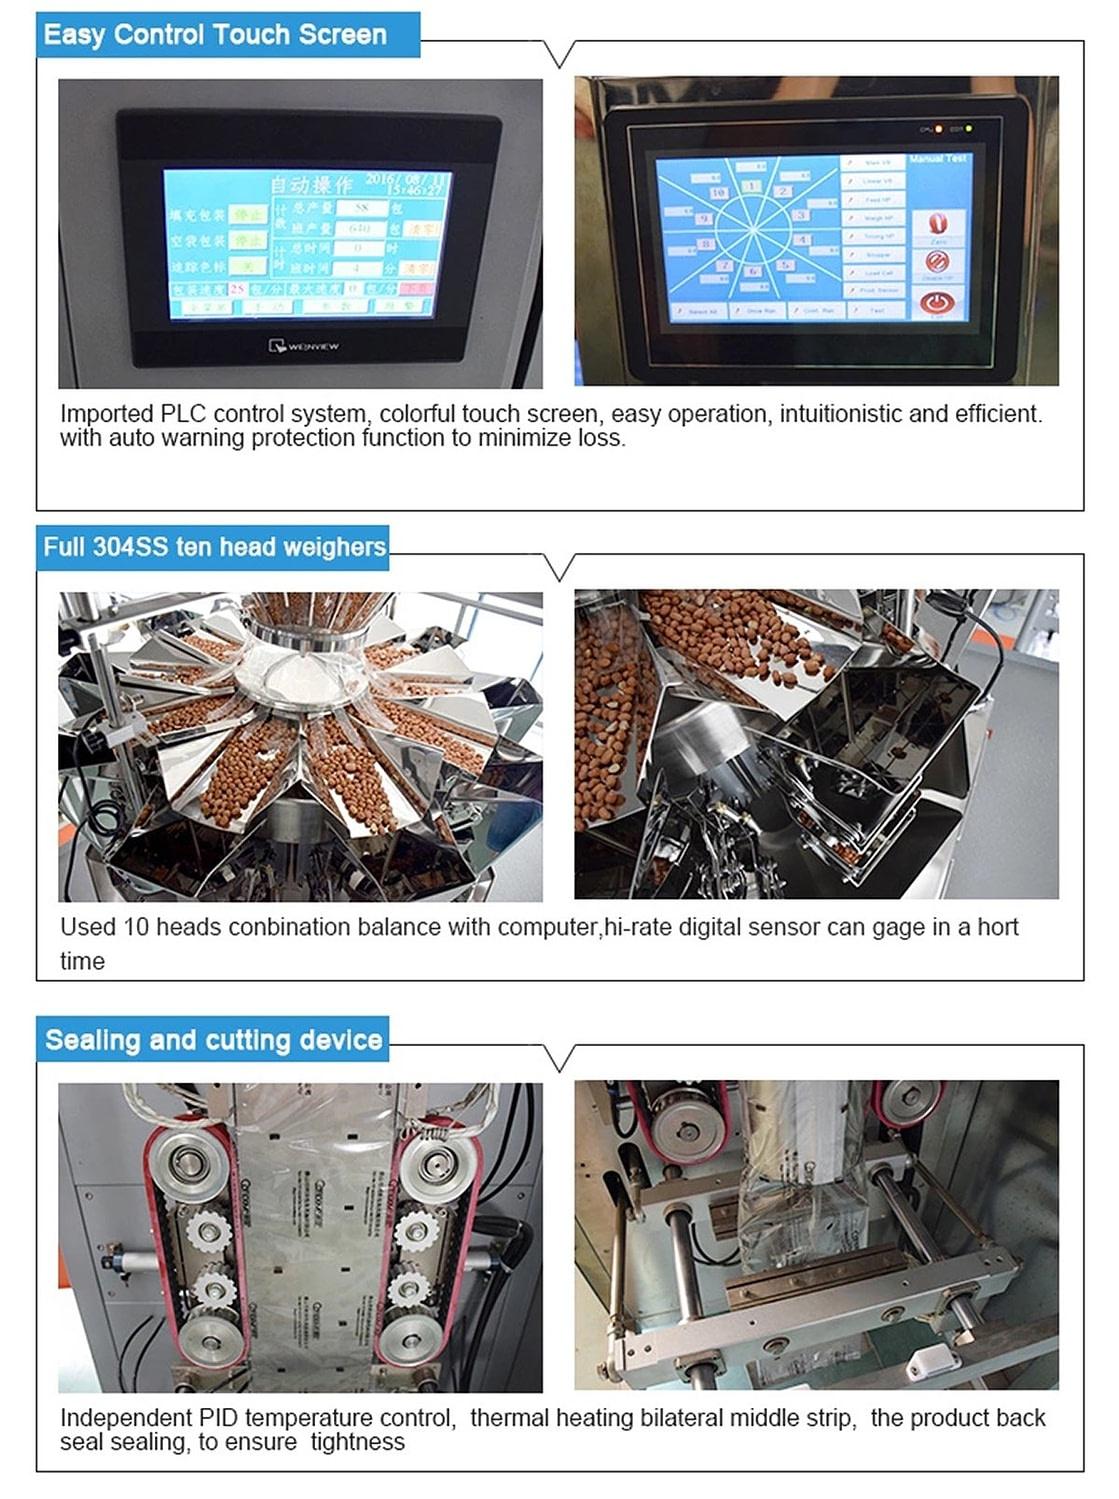 Machine Description